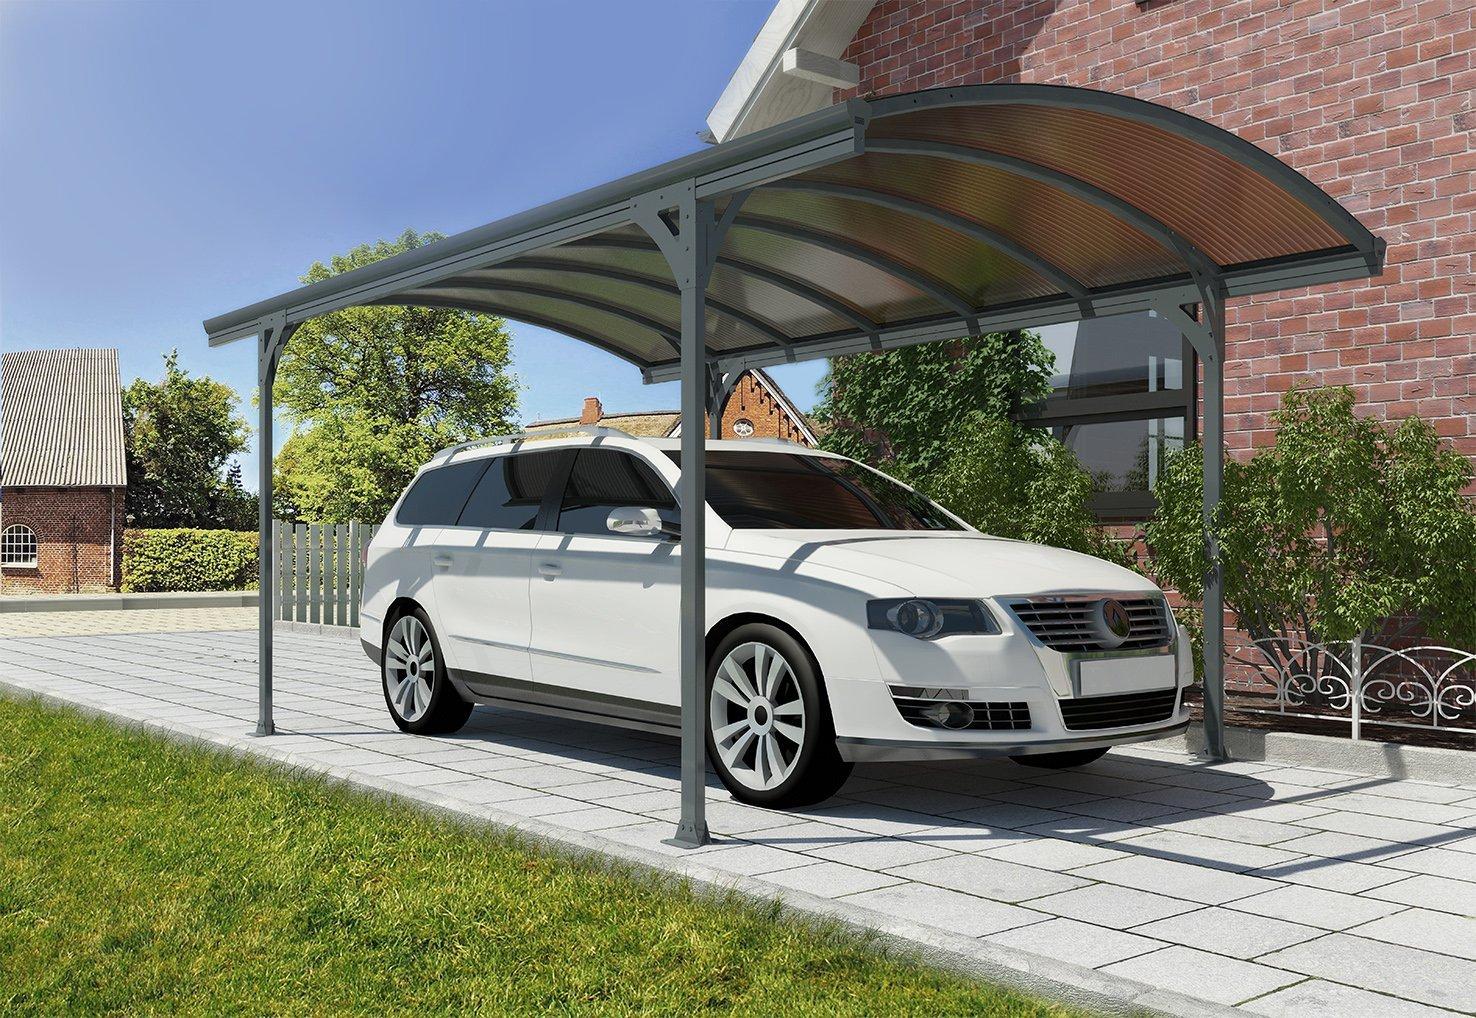 Review Of Palram Vitoria 5000 Carport Roof | The Car Stuff concernant Carport Camping Car Brico Depot